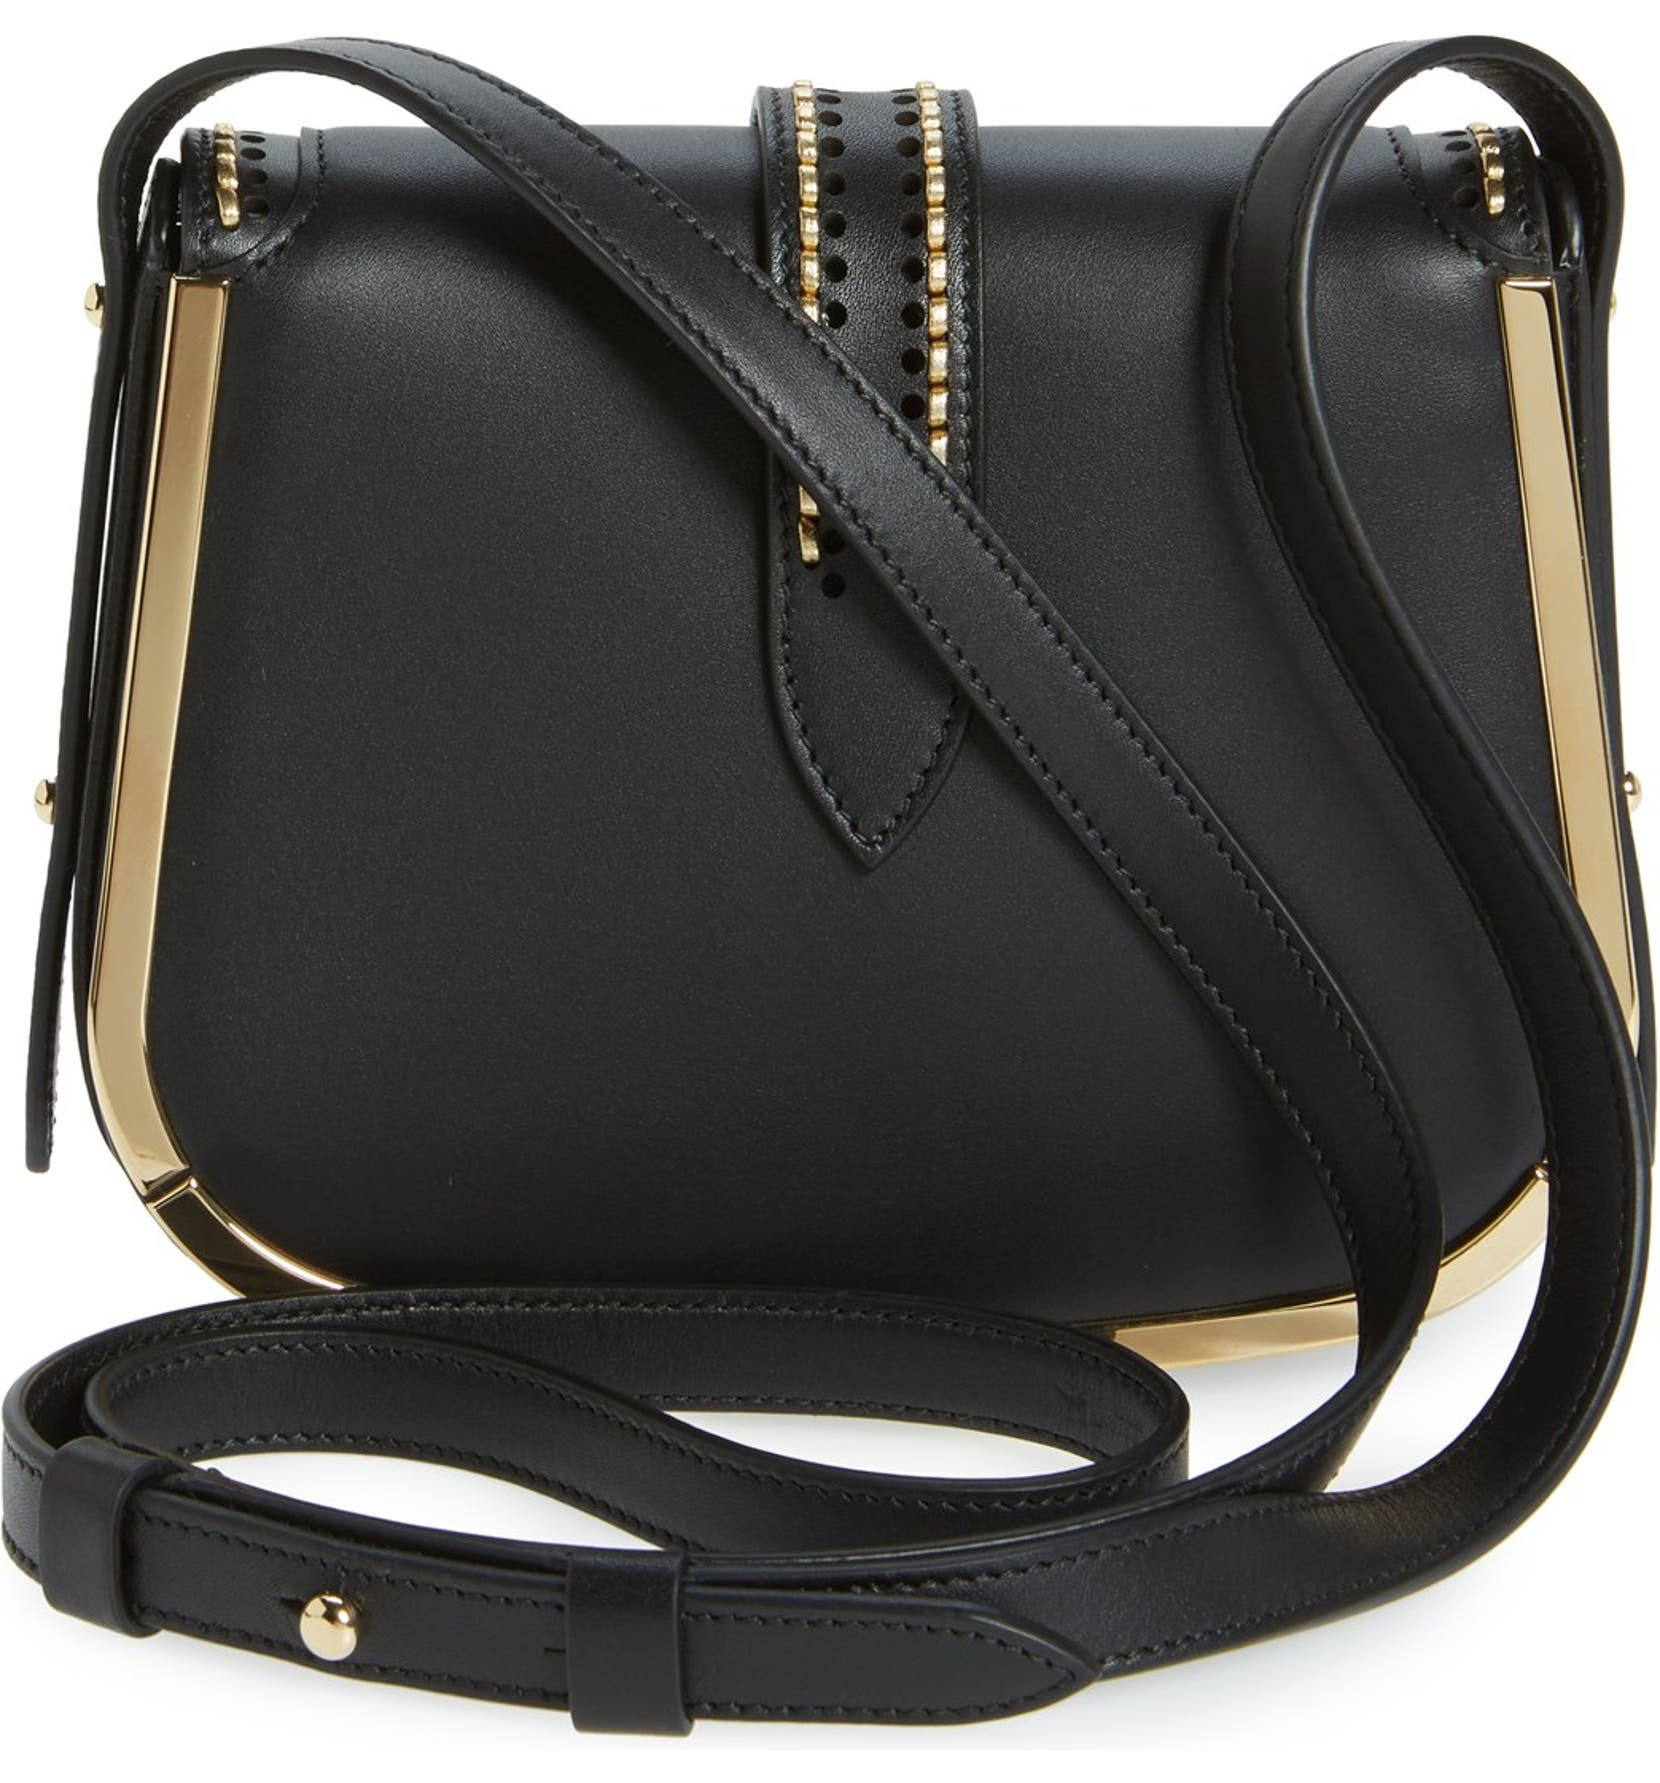 Salvatore Ferragamo  Sabine  Nappa Leather Saddle Bag  e0c37ff12291a